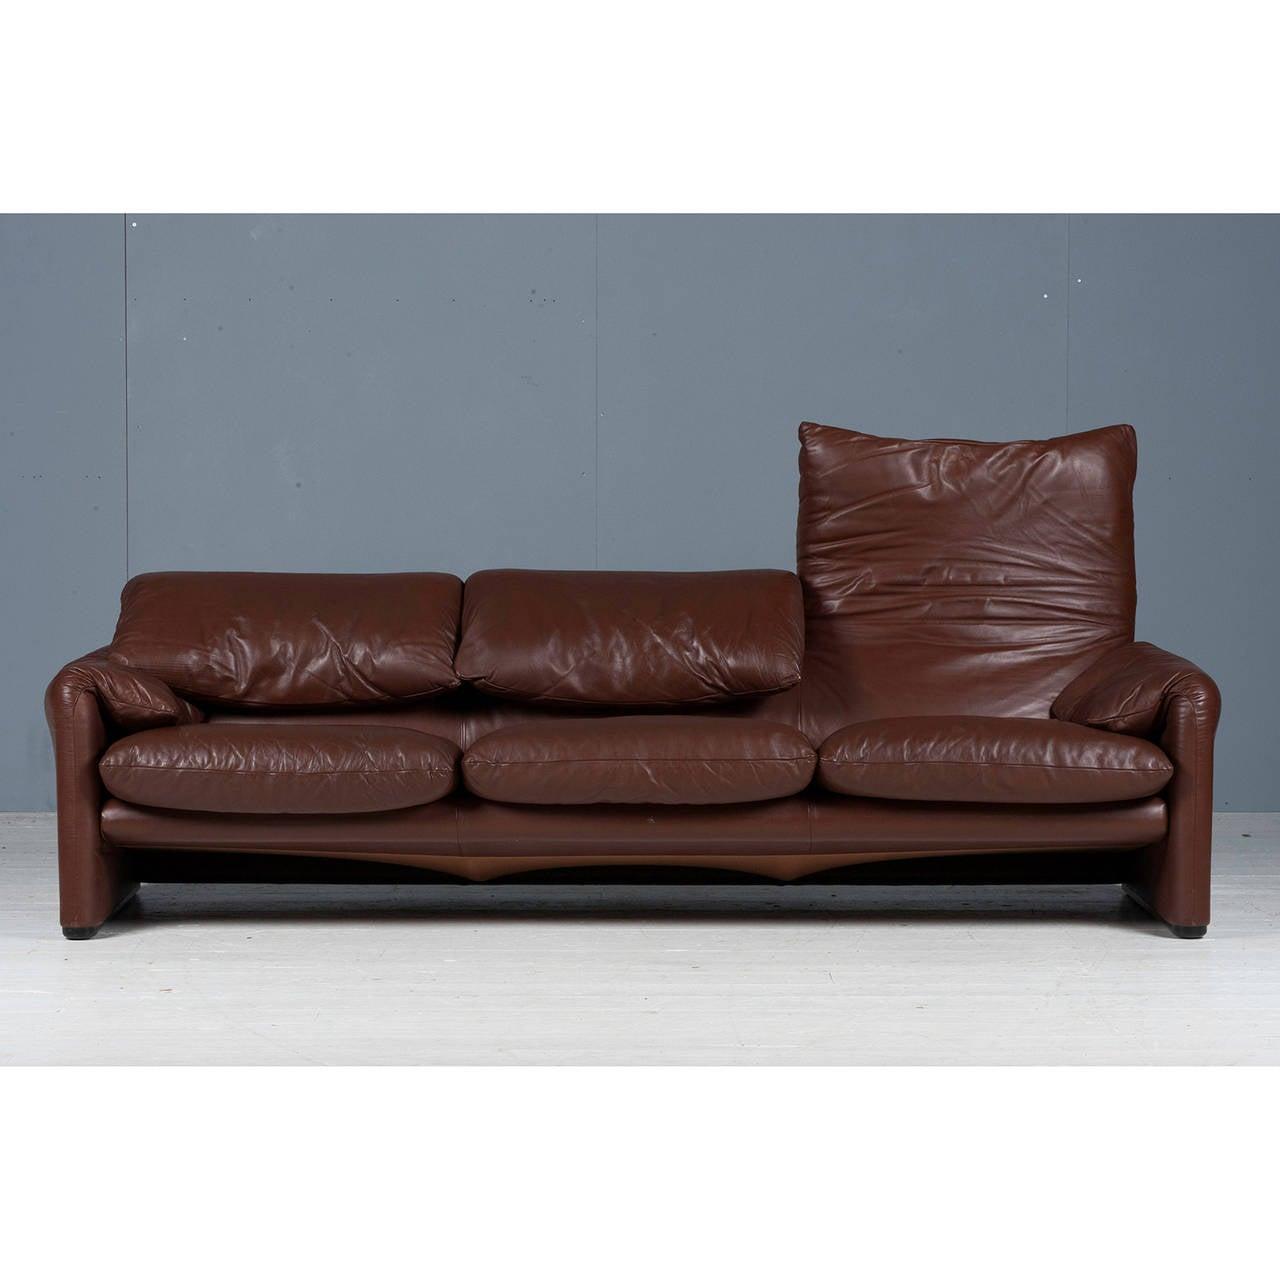 Maralunga three seat sofa by vico magistretti for cassina for Cassina italy